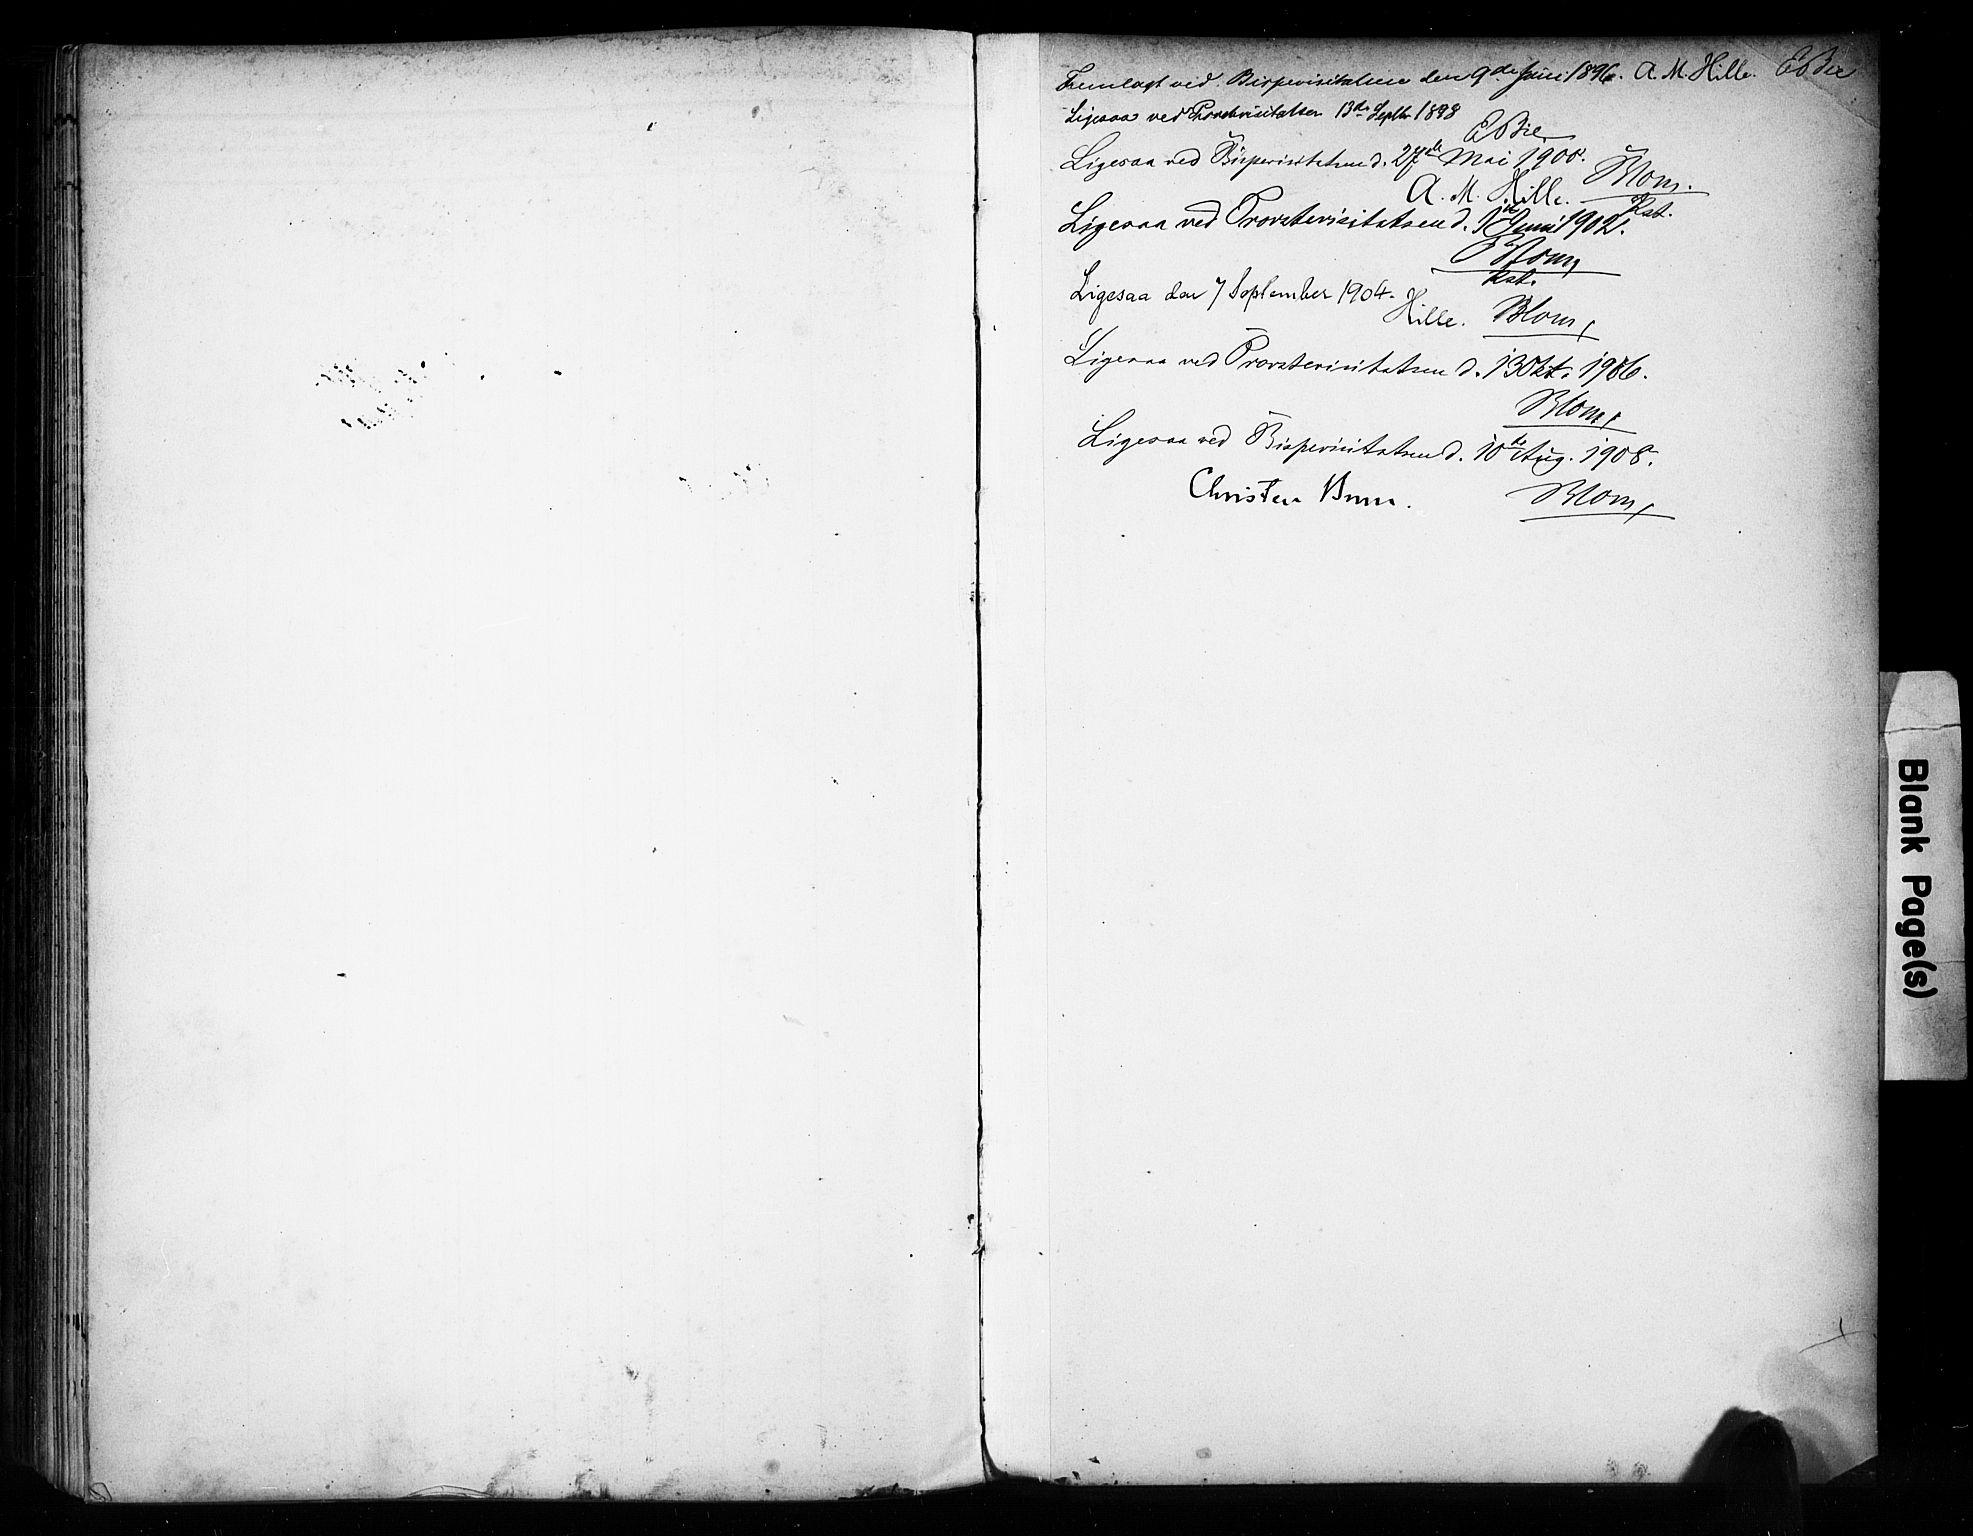 SAH, Vestre Toten prestekontor, H/Ha/Haa/L0011: Ministerialbok nr. 11, 1895-1906, s. 400